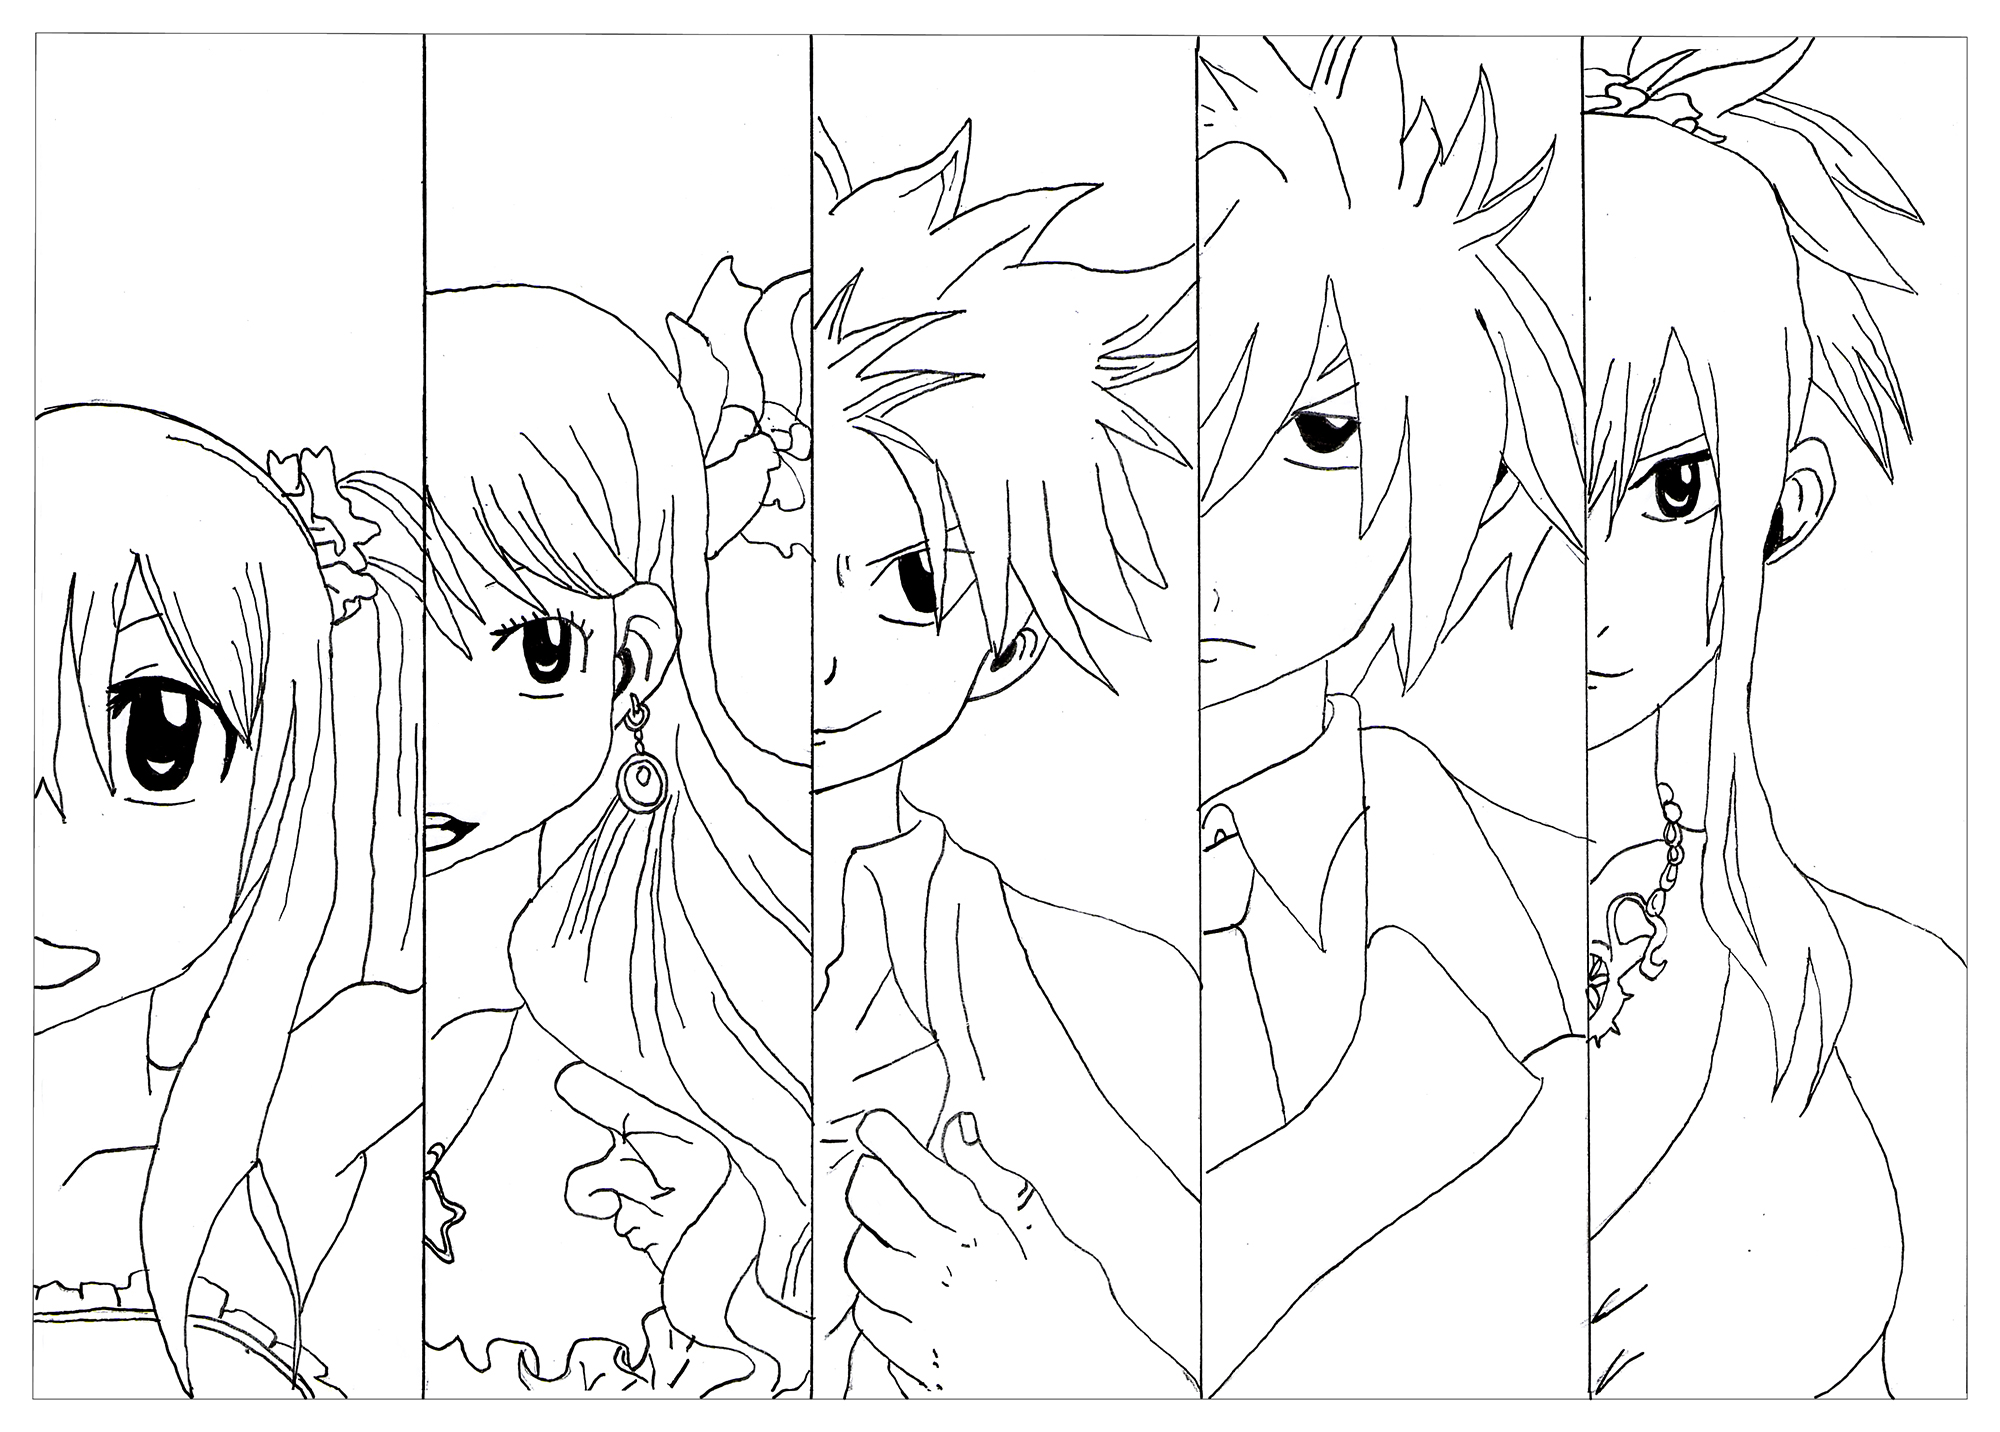 Colorear para adultos : Mangas - 23